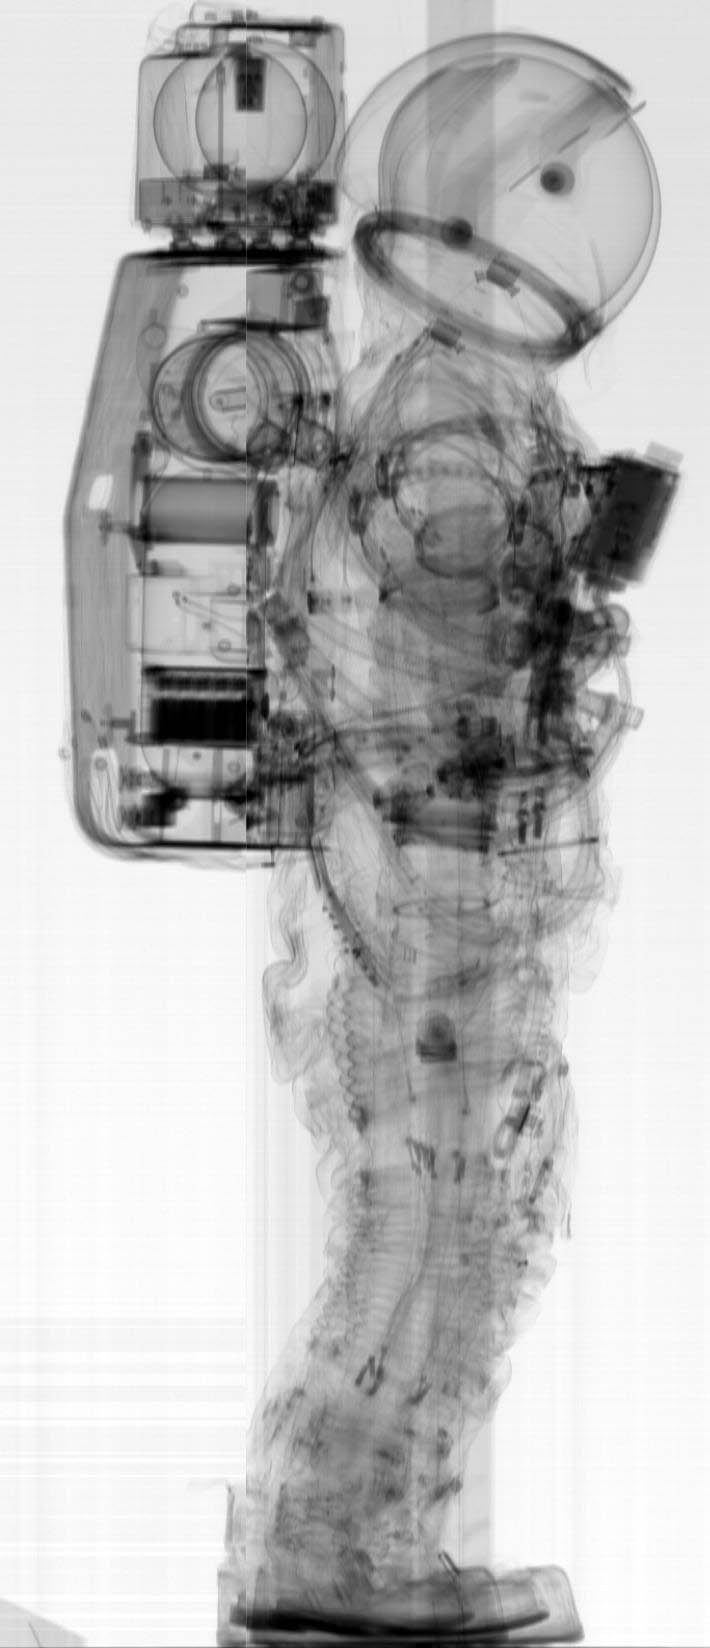 apollo space suit x ray - photo #1